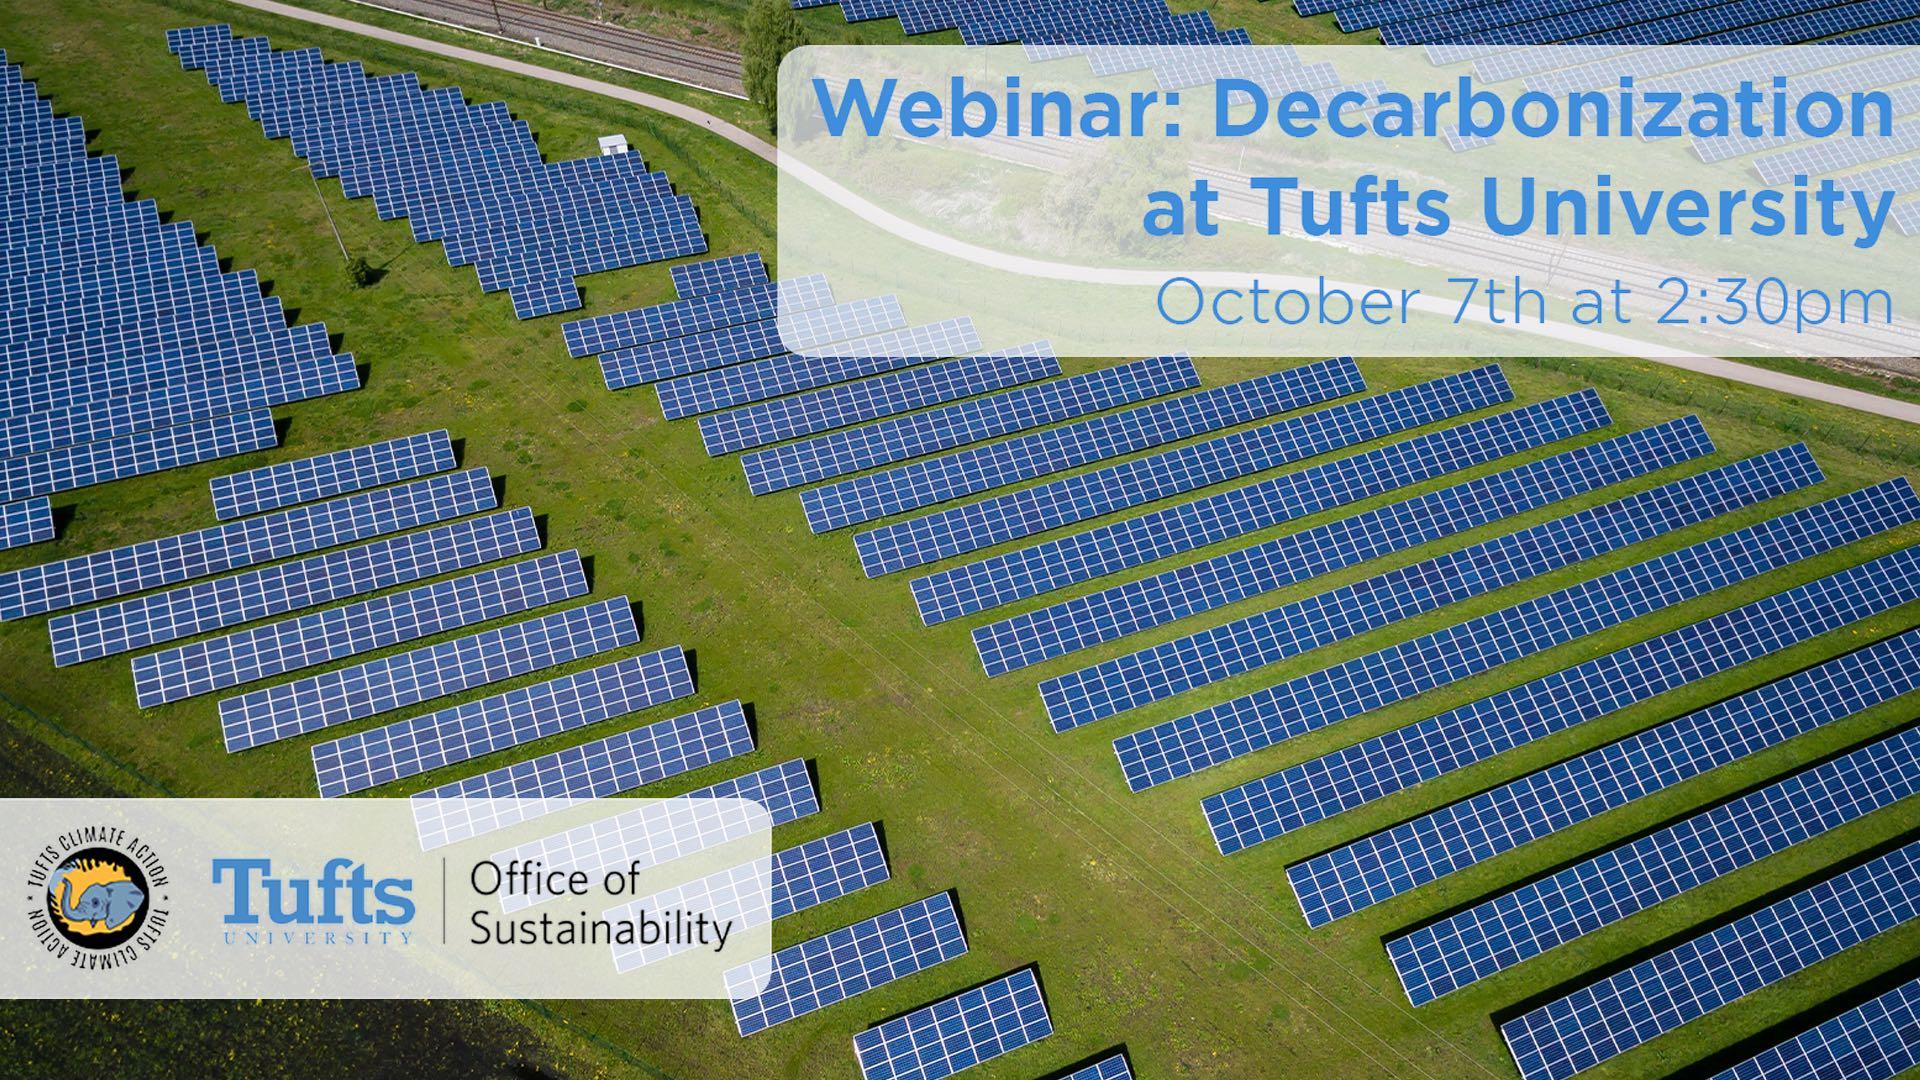 [WEBINAR] Decarbonization at Tufts